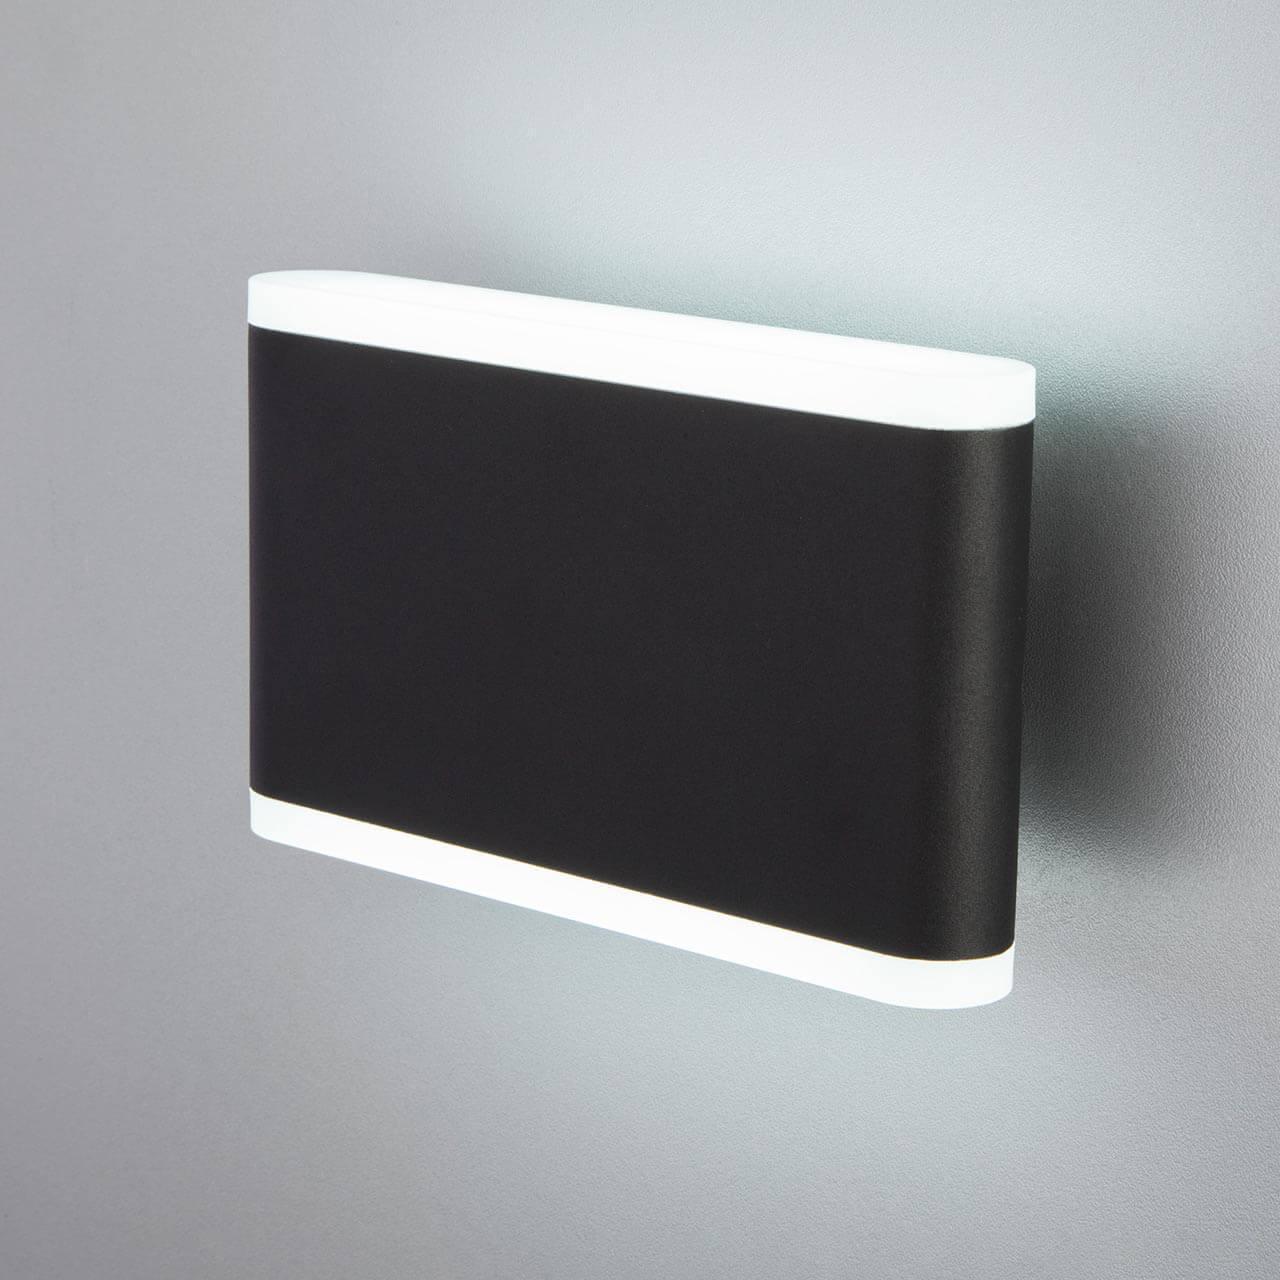 Уличный светильник Elektrostandard 4690389128073, LED уличный настенный светодиодный светильник elektrostandard 1605 techno led sokar графит 4690389086038